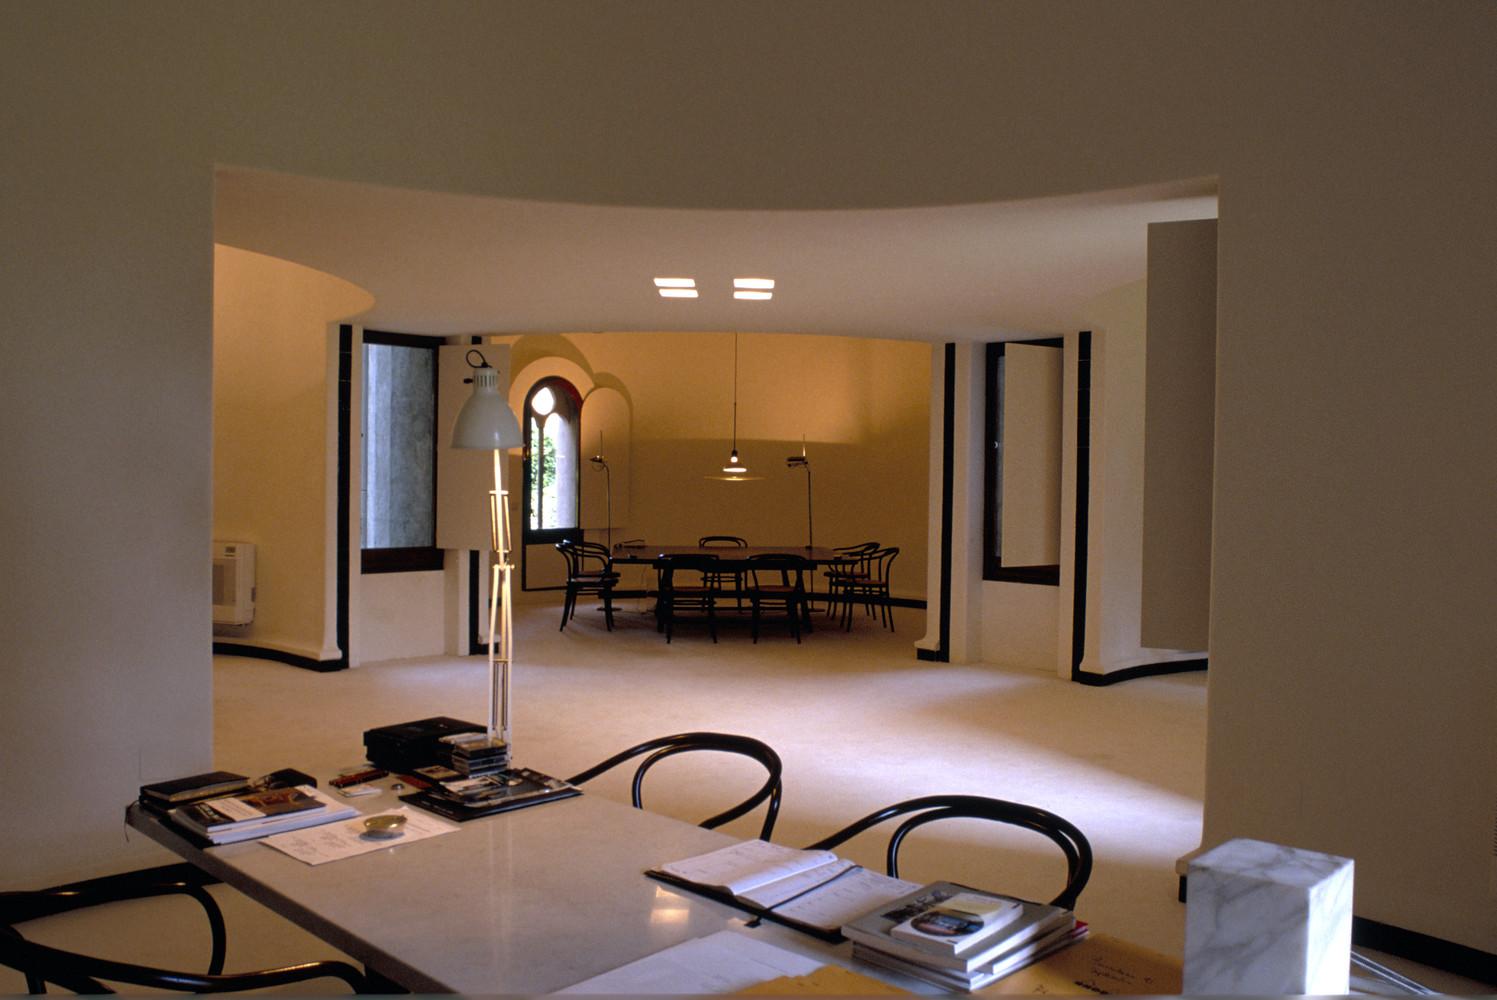 Ricardo_Bofill_Taller_Arquitectura_SantJustDesvern_Barcelona_Spain_WorkSpace_(5).jpg